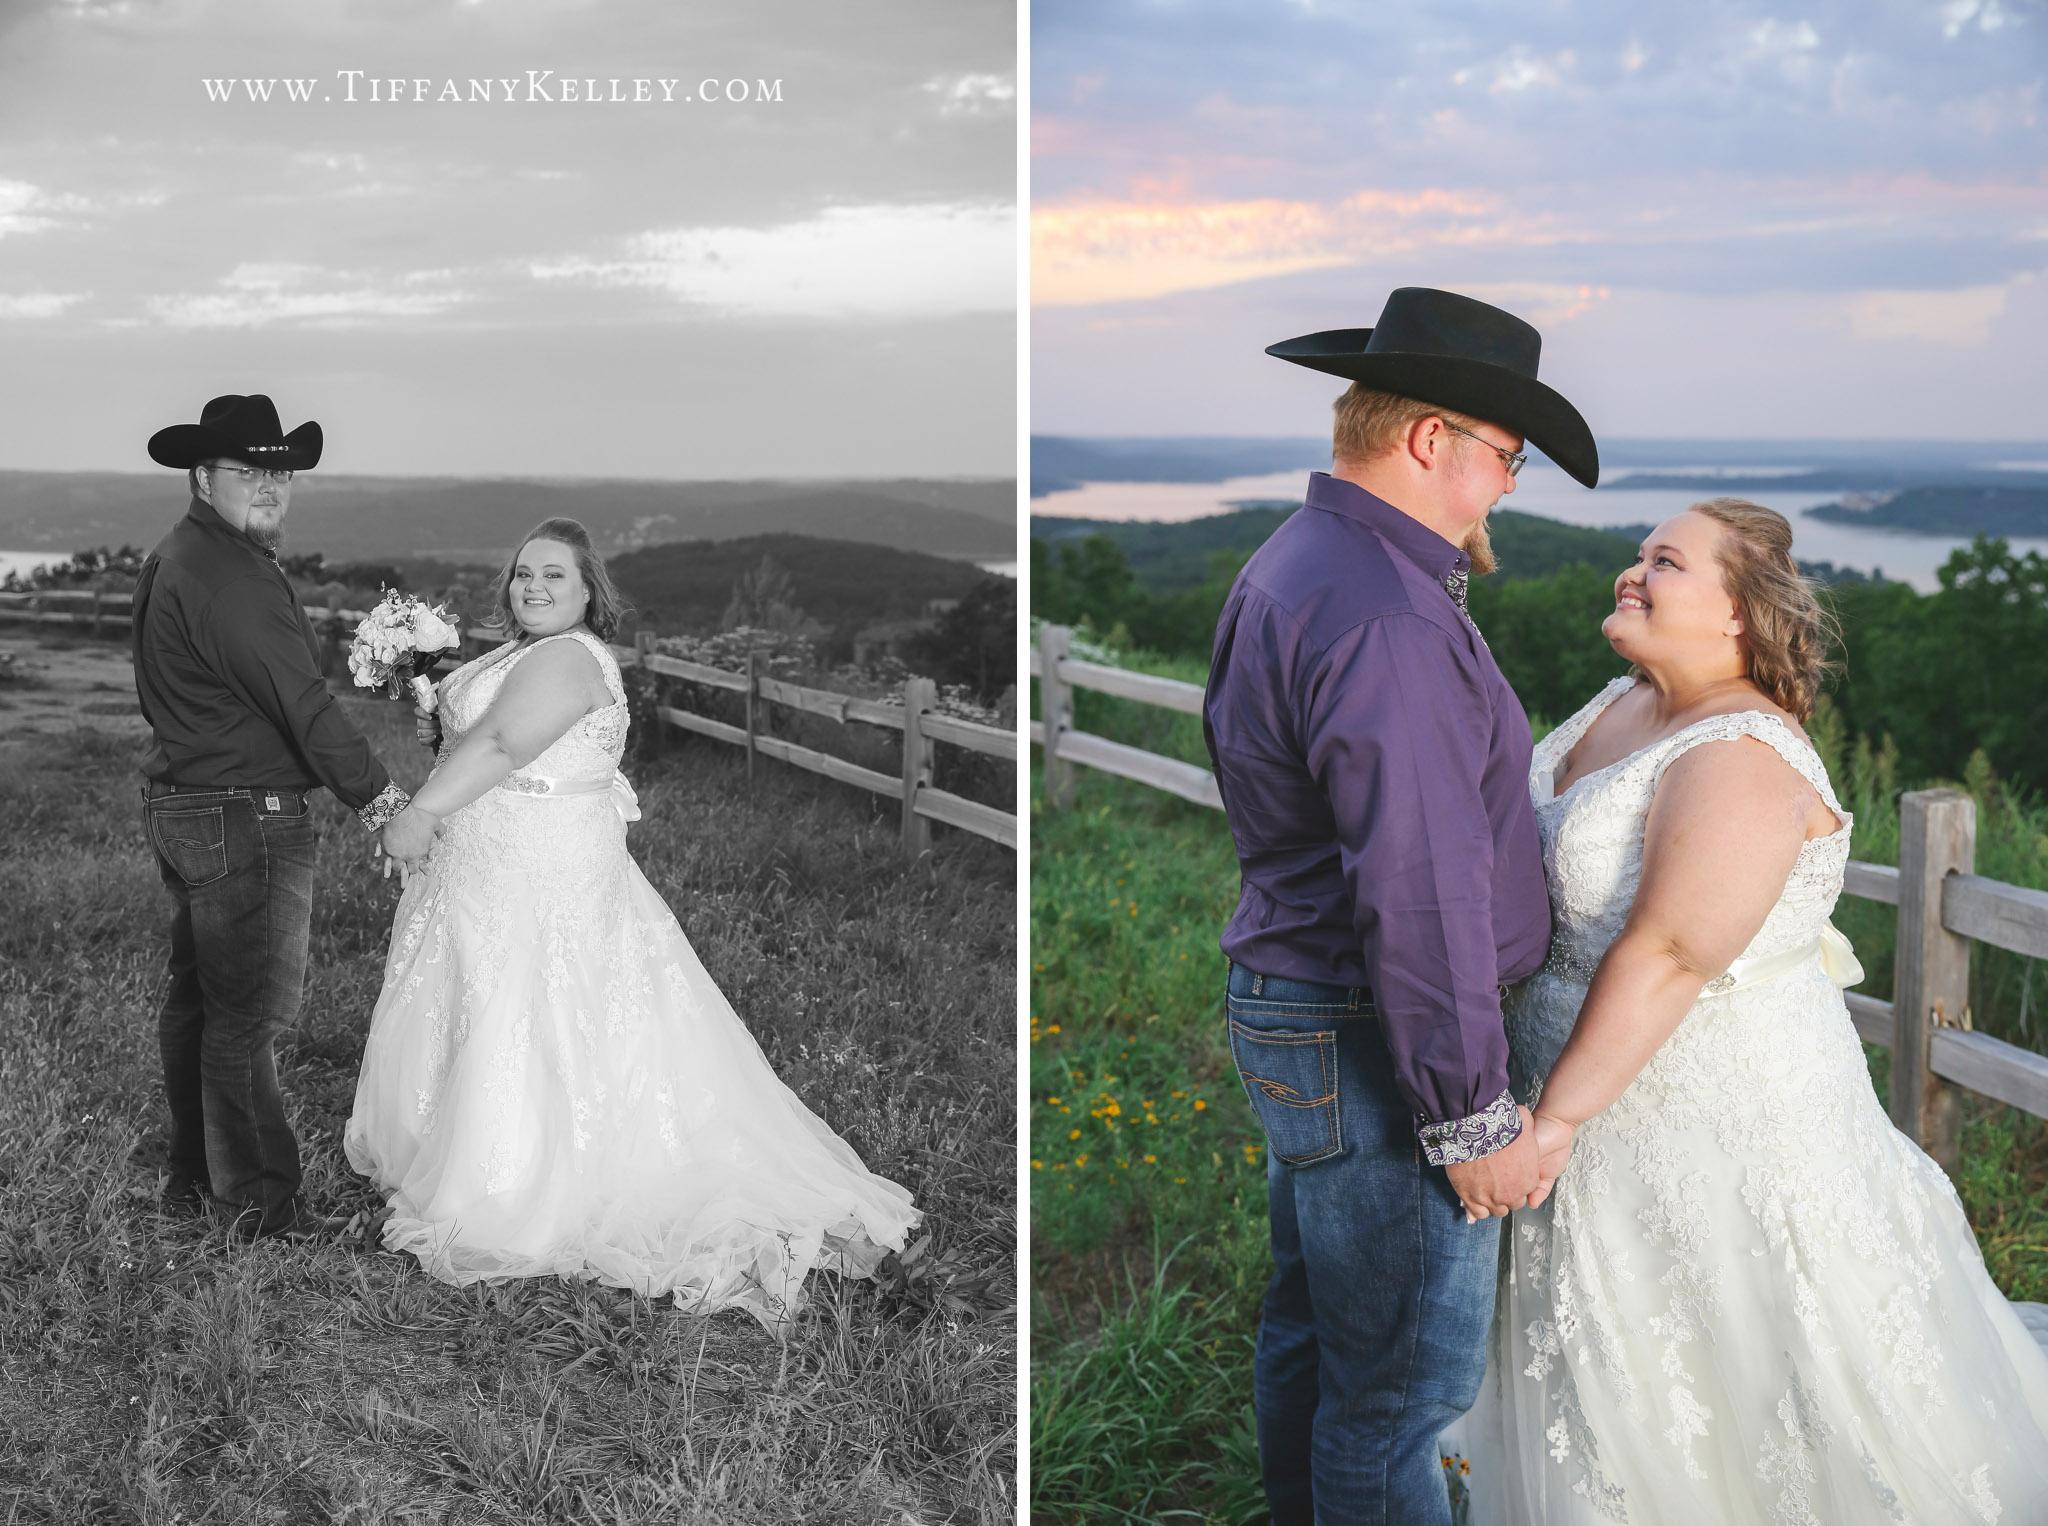 branson-missouri-big-cedar-lodge-wedding-photographer-tiffany-kelley-photography-16